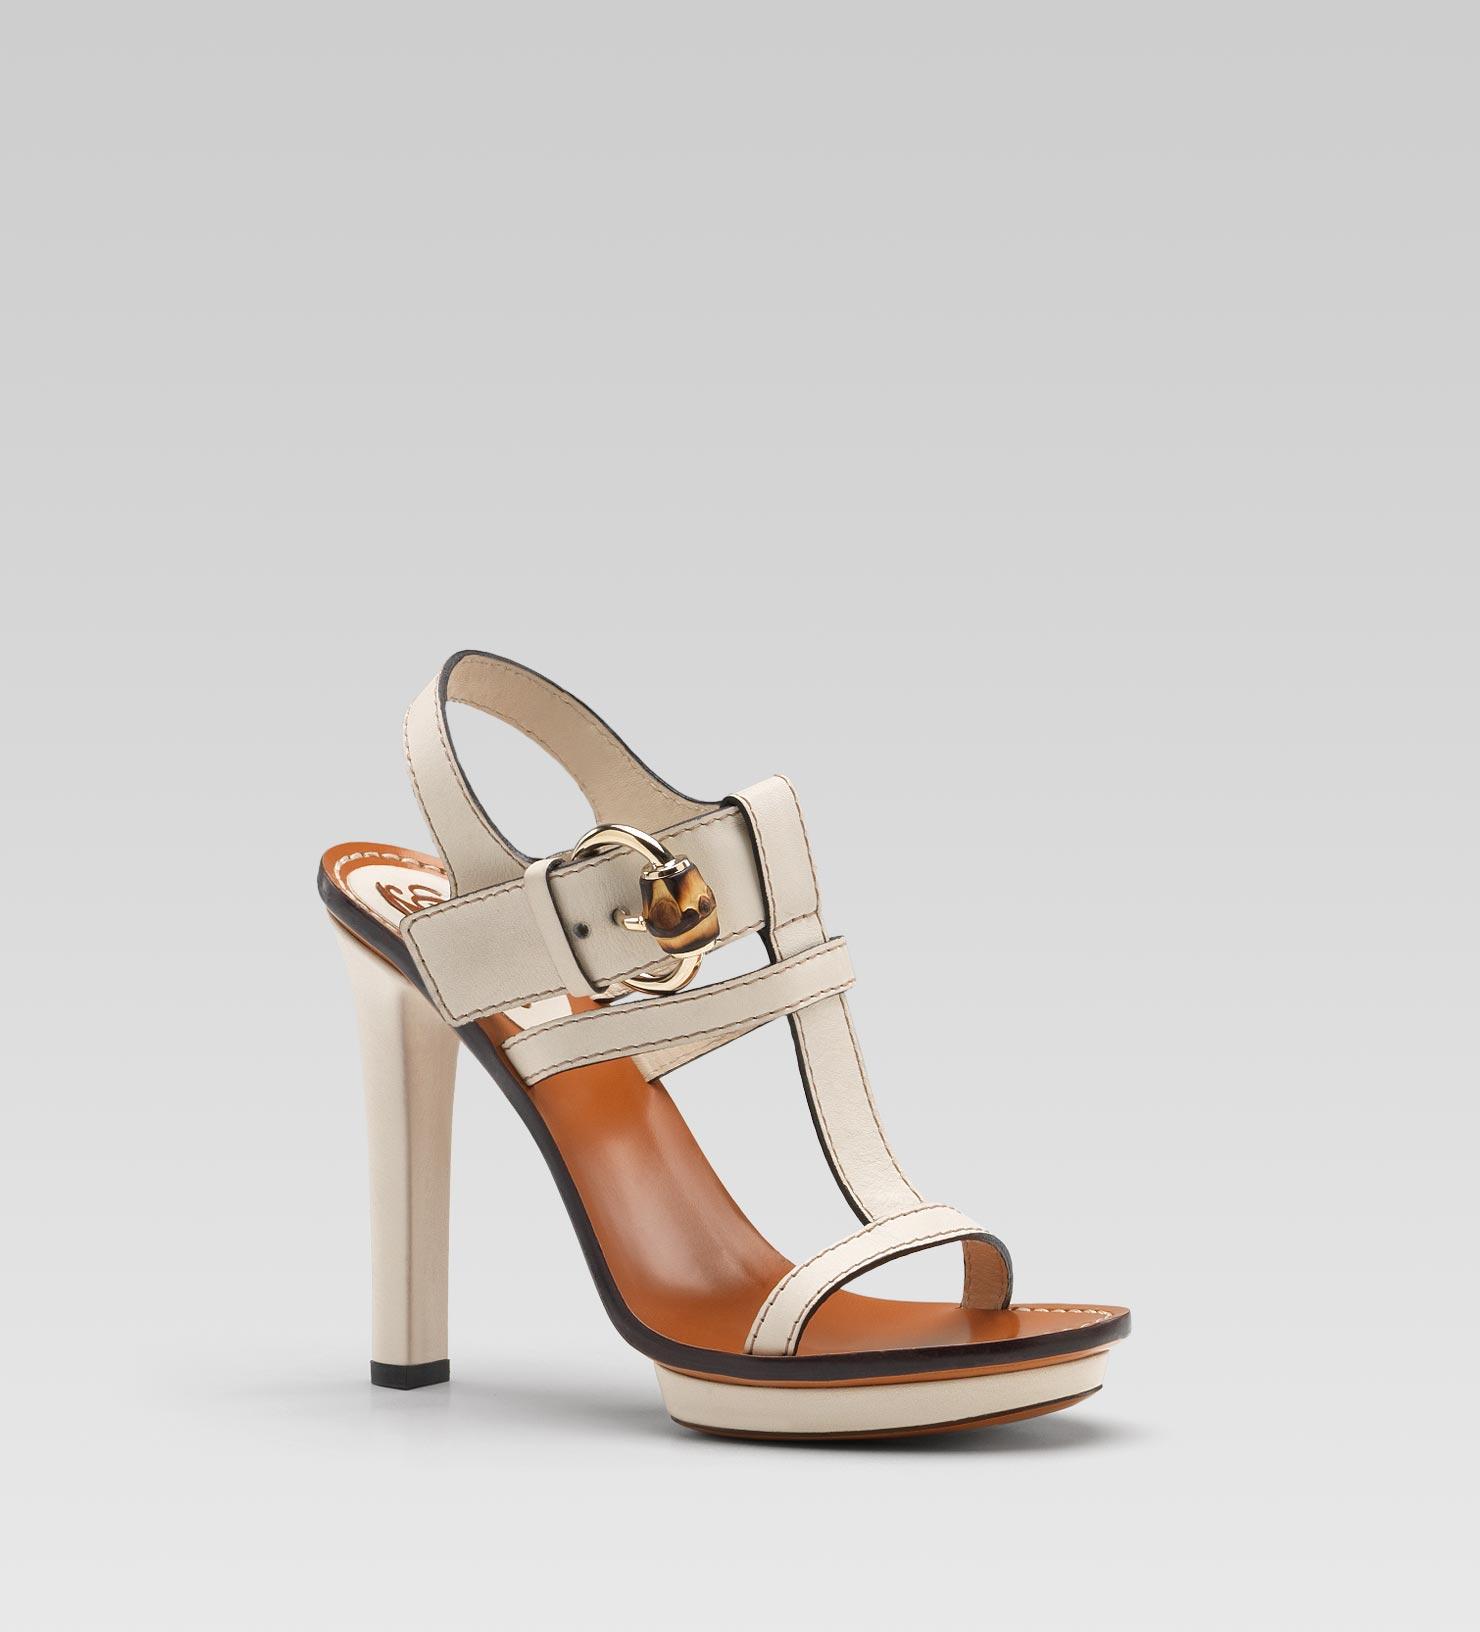 c9f0f3ef8 Gucci Gwen High Heel Platform Sandal in Natural - Lyst